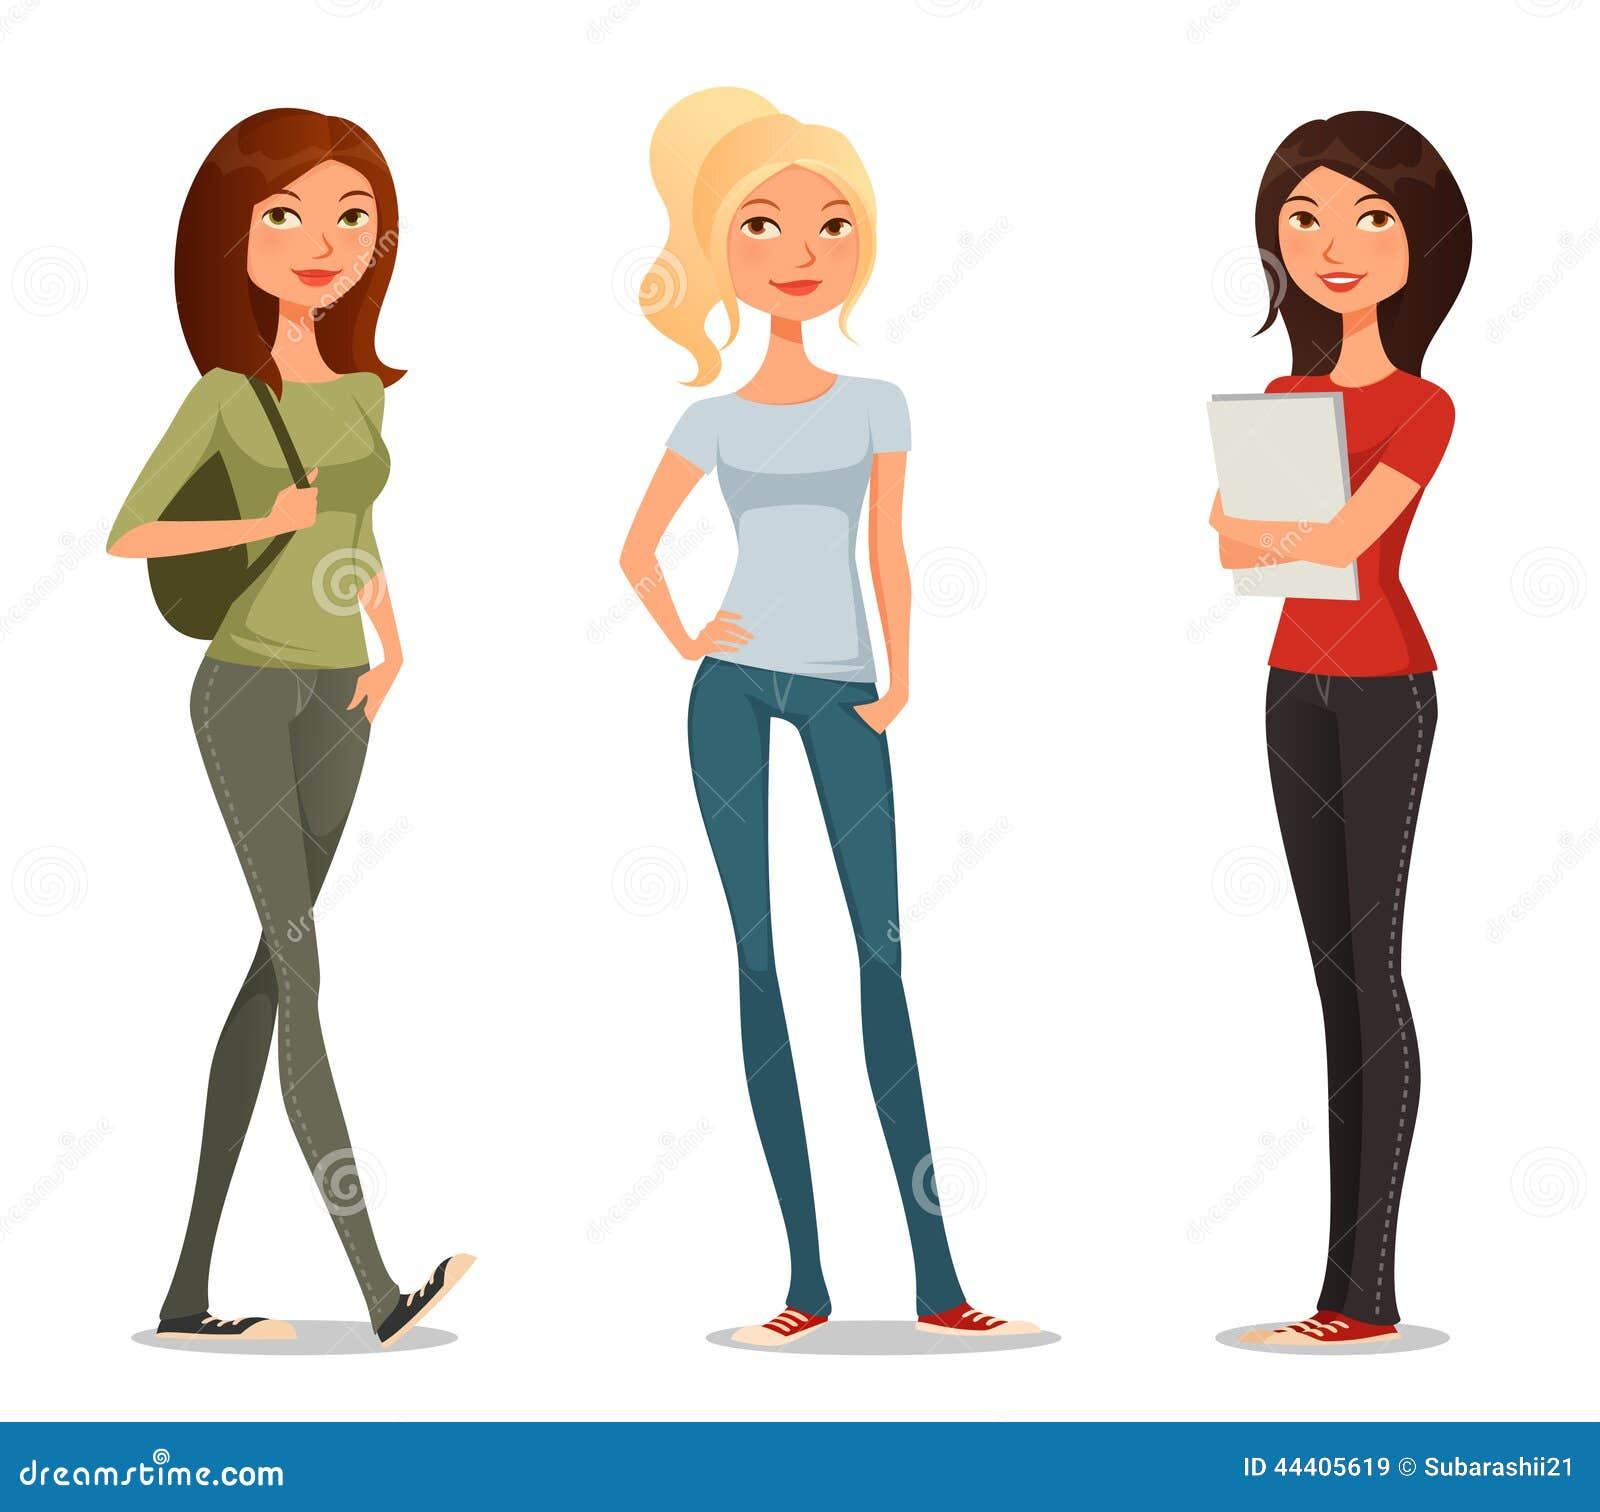 Personaje DE Dibujos Animados DE Chica Adolescente